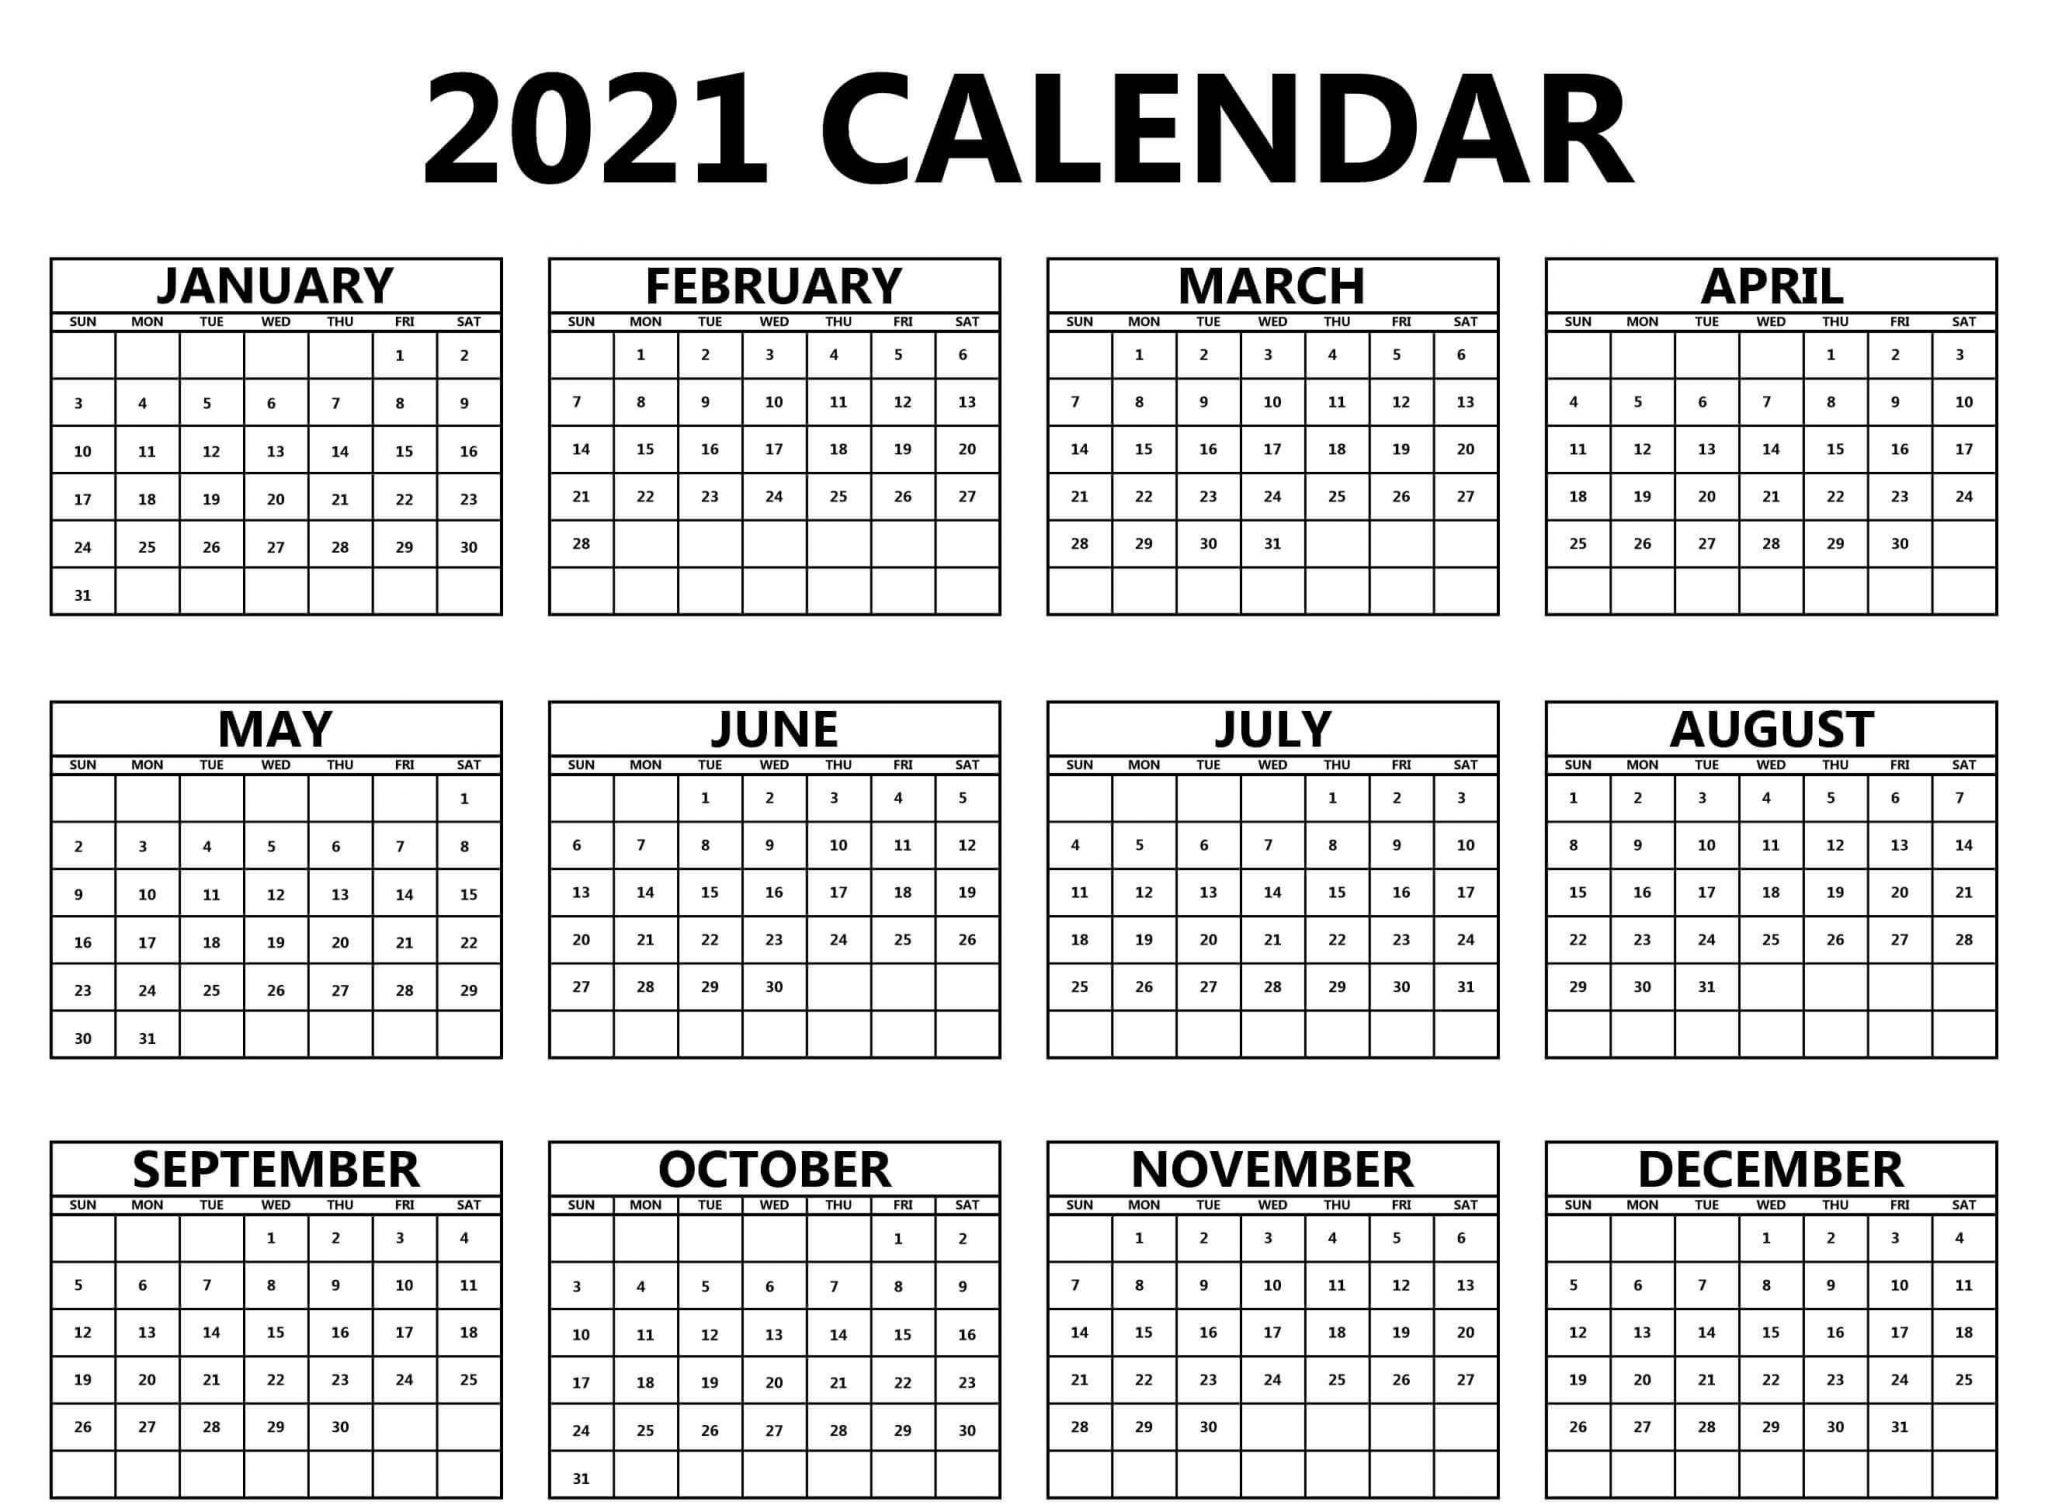 Blank Yearly Calendar 2021